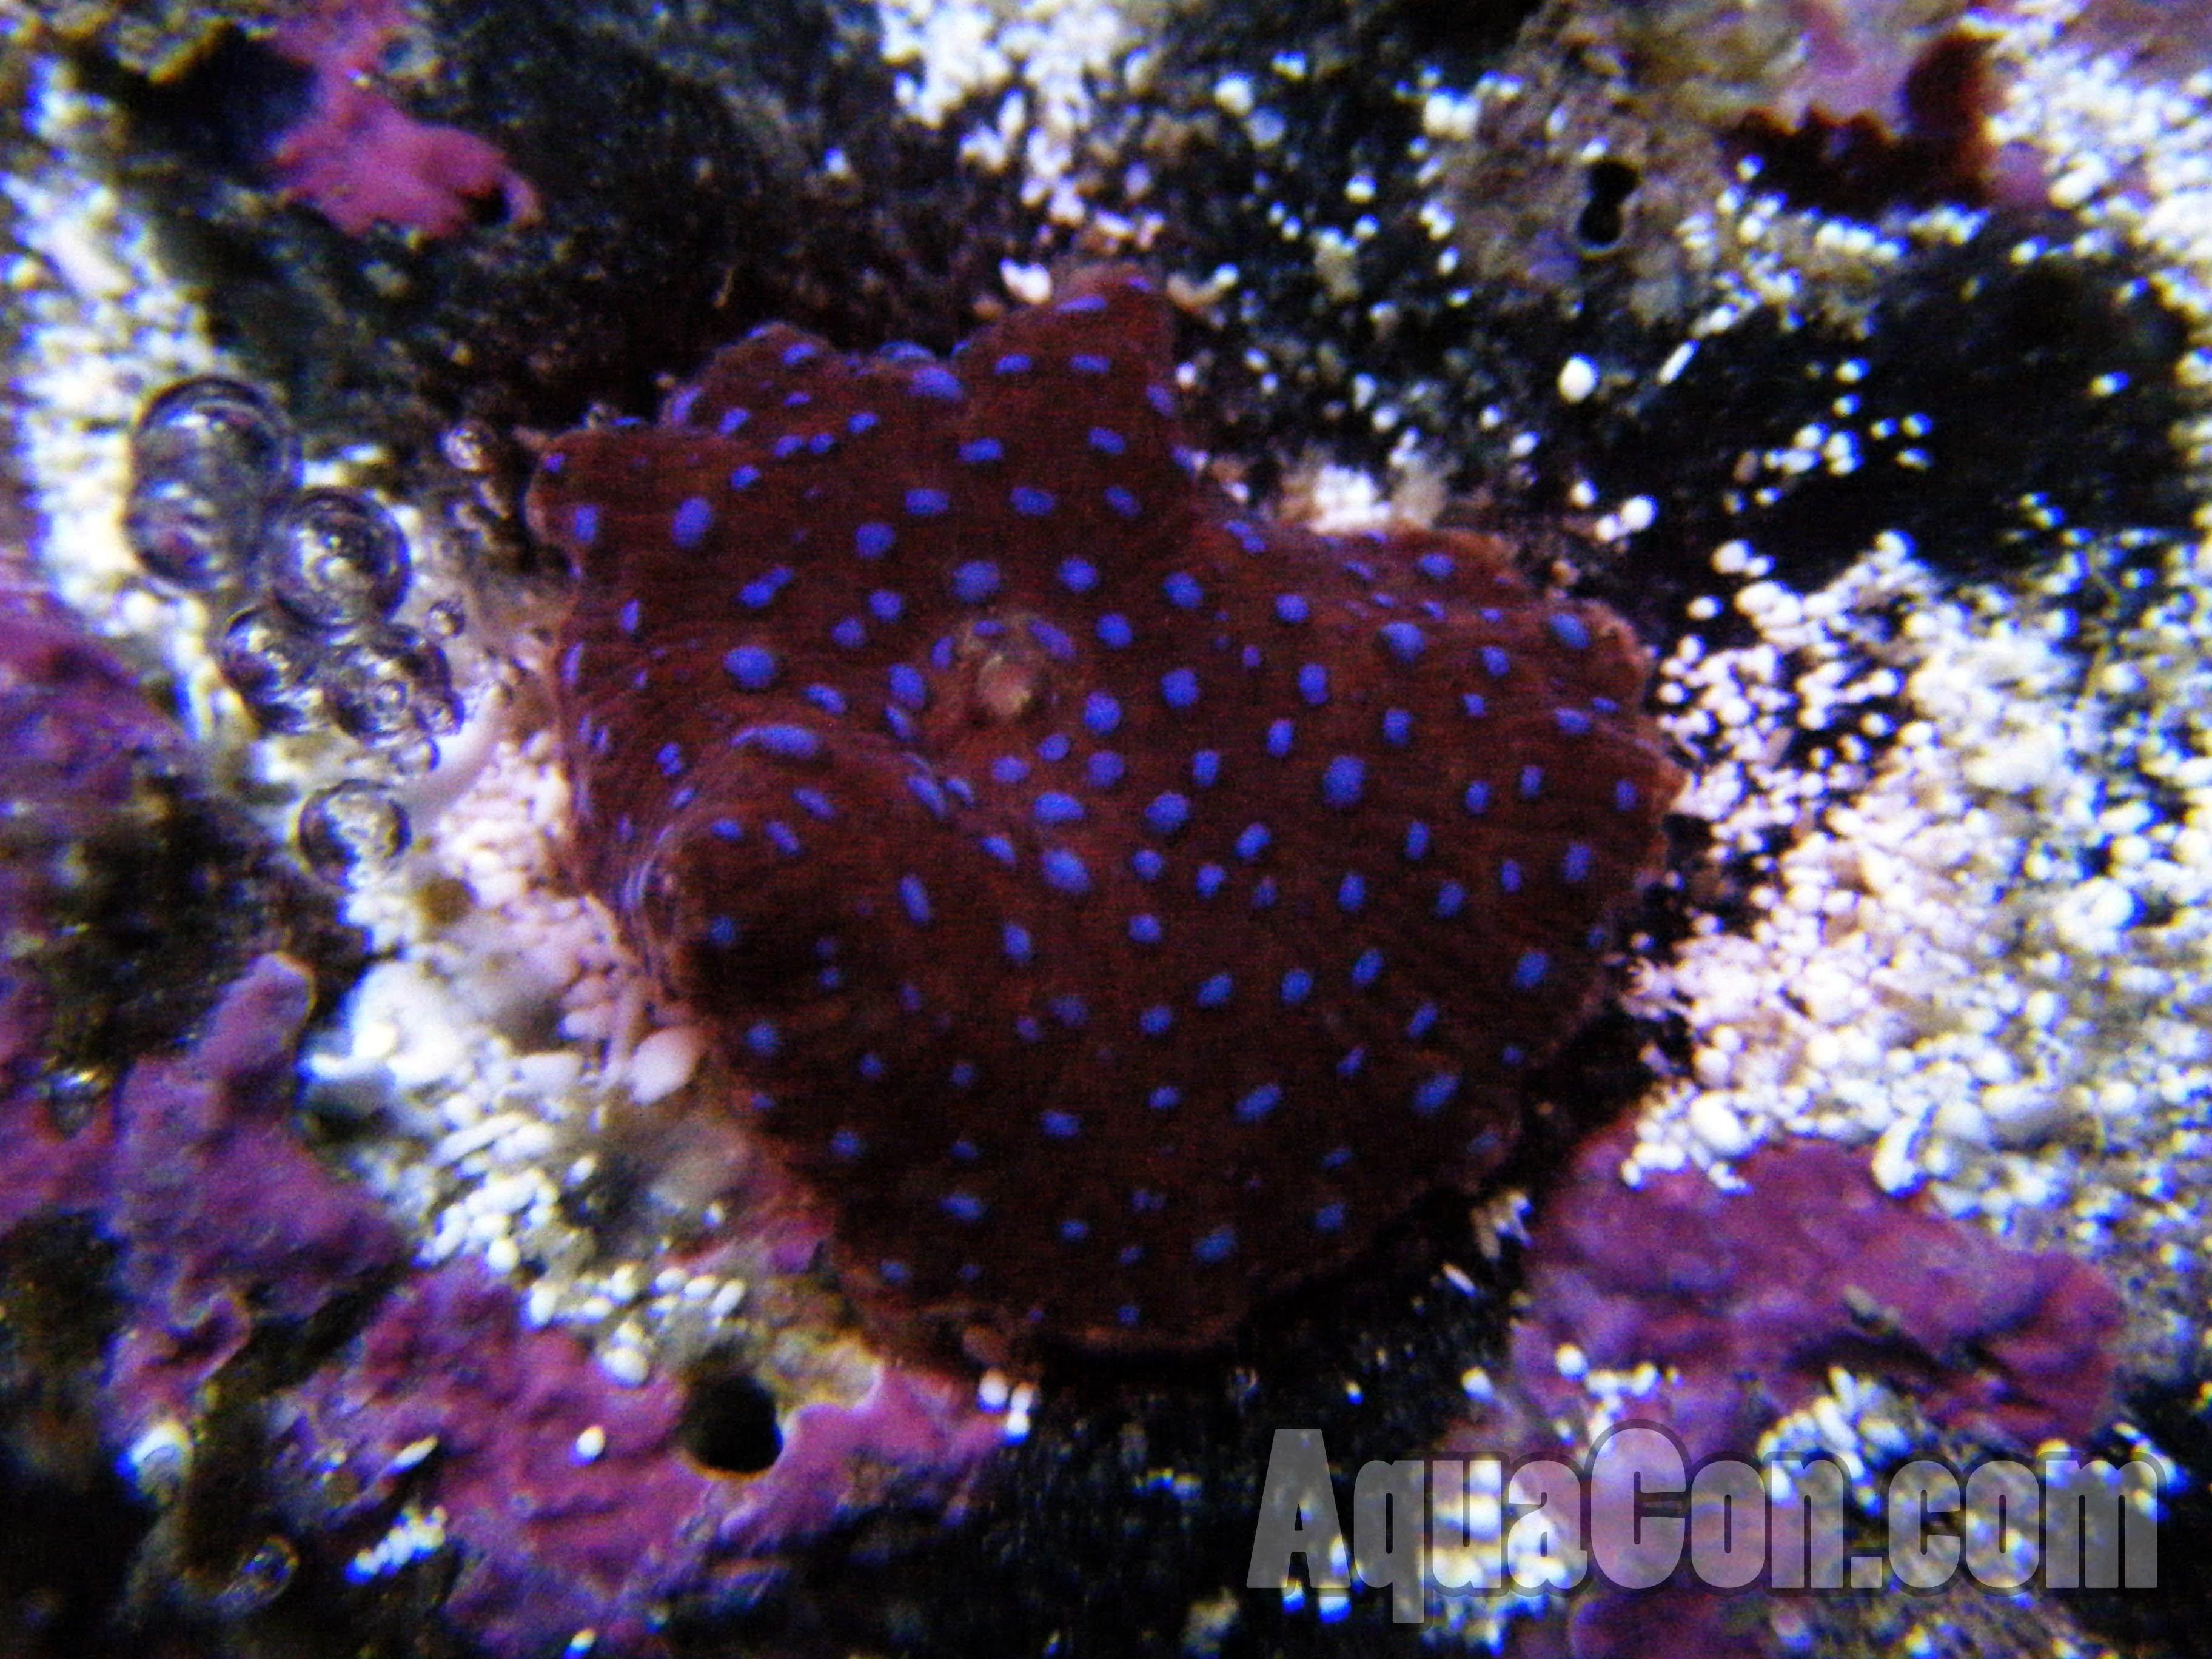 Mushroom Coral Reef Aquarium Mushroom Live Coral Corals For Sale Saltwater Aquarium Stuffed Mushrooms